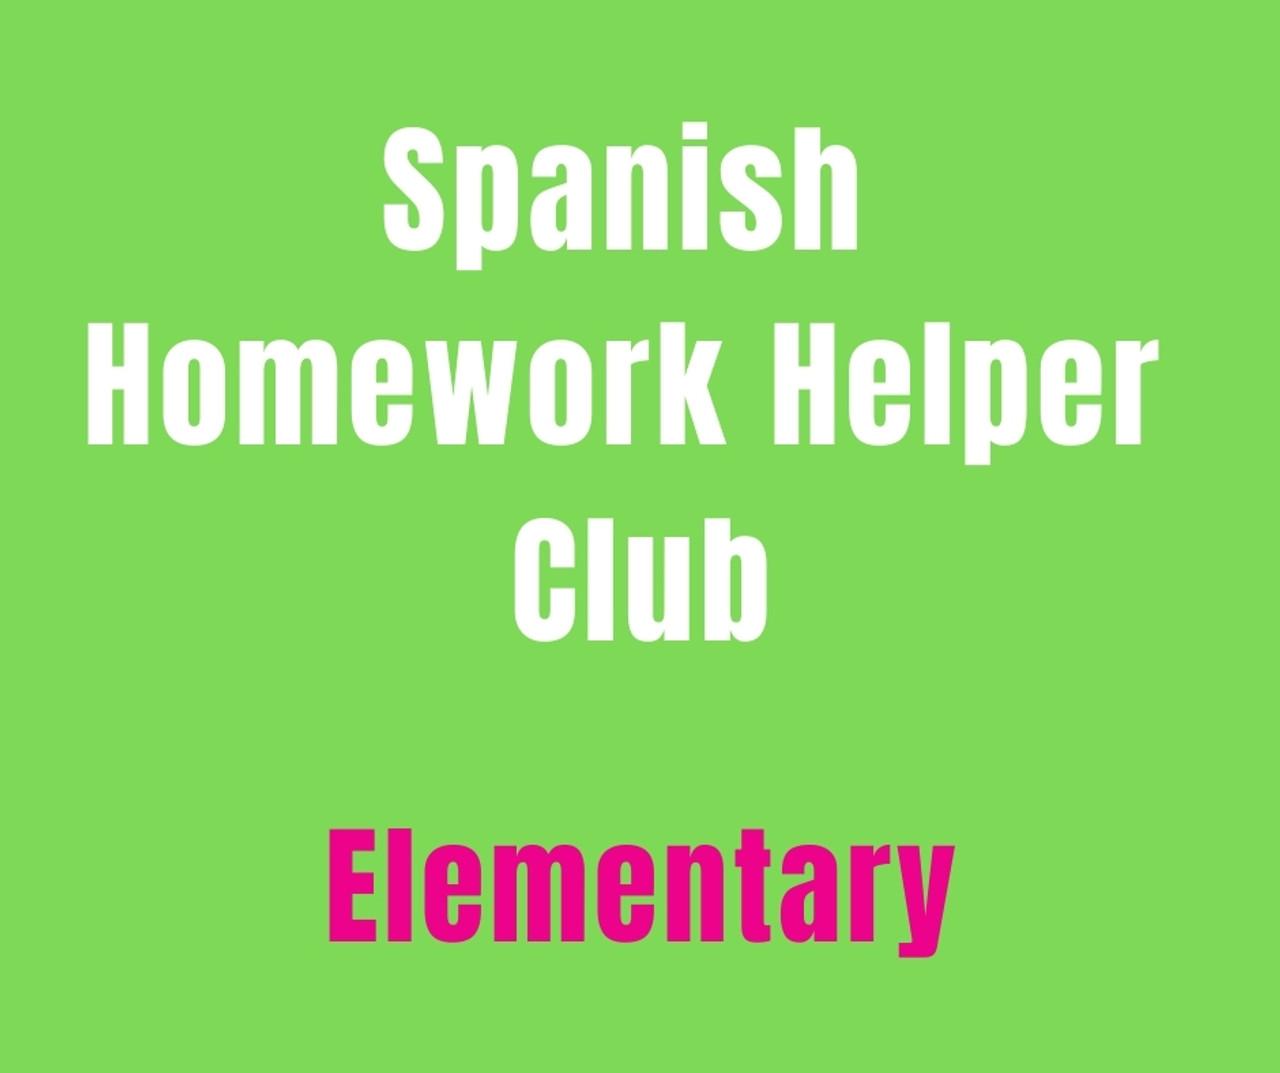 medium resolution of SPANISH HOMEWORK HELPER CLUB (K-5) ELEMENTARY *LIMITED AVAILABILITY -  Spanishtime